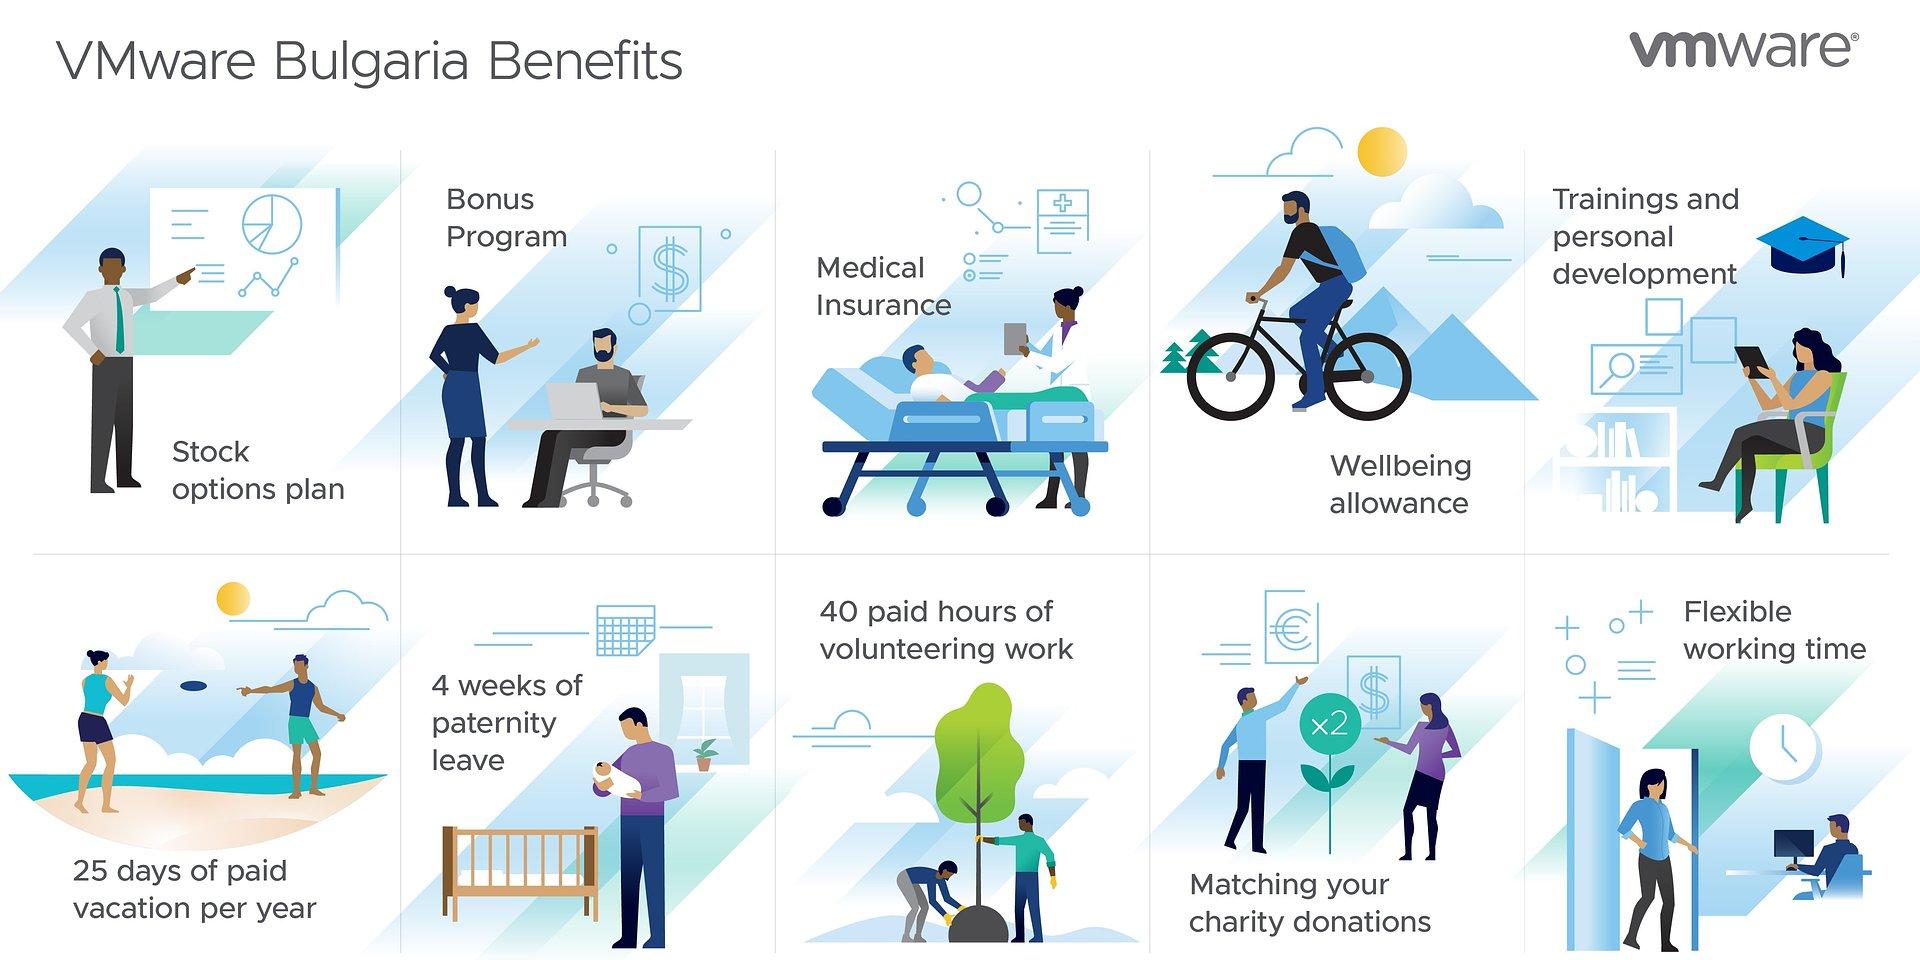 VMware Bulgaria Benefits